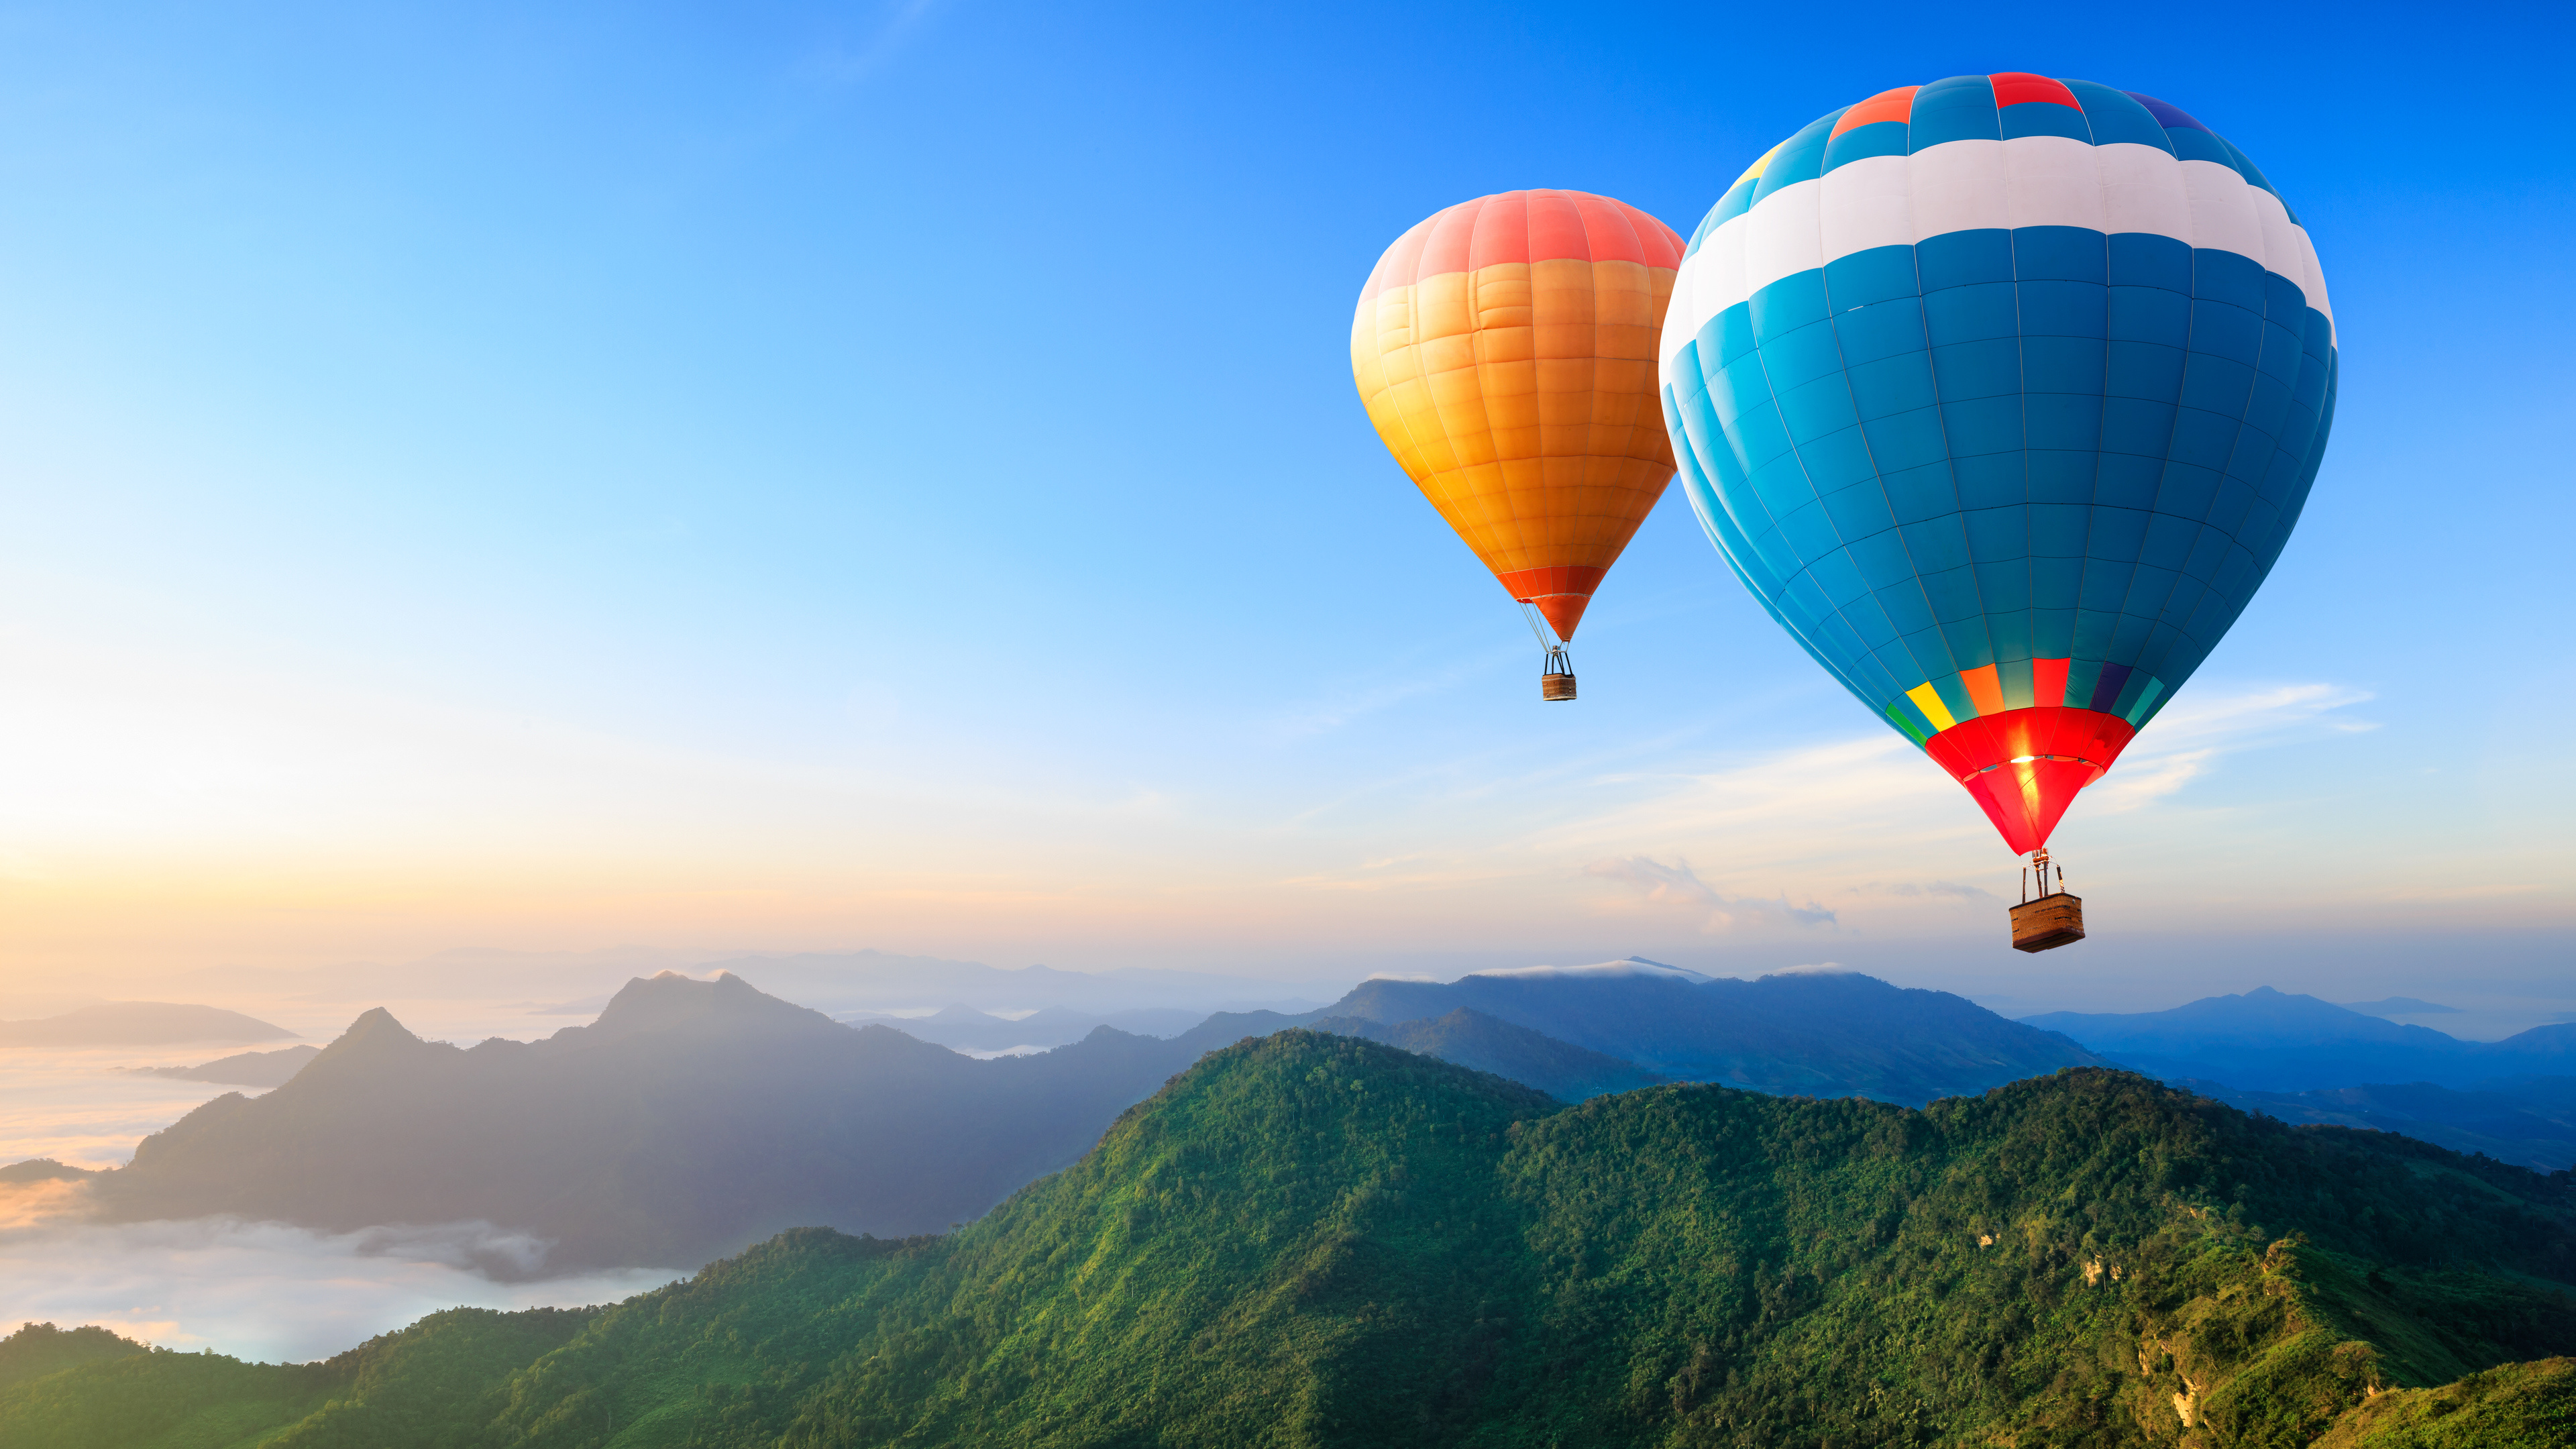 Hot Air Balloon 4k, HD Nature, 4k Wallpapers, Images ...